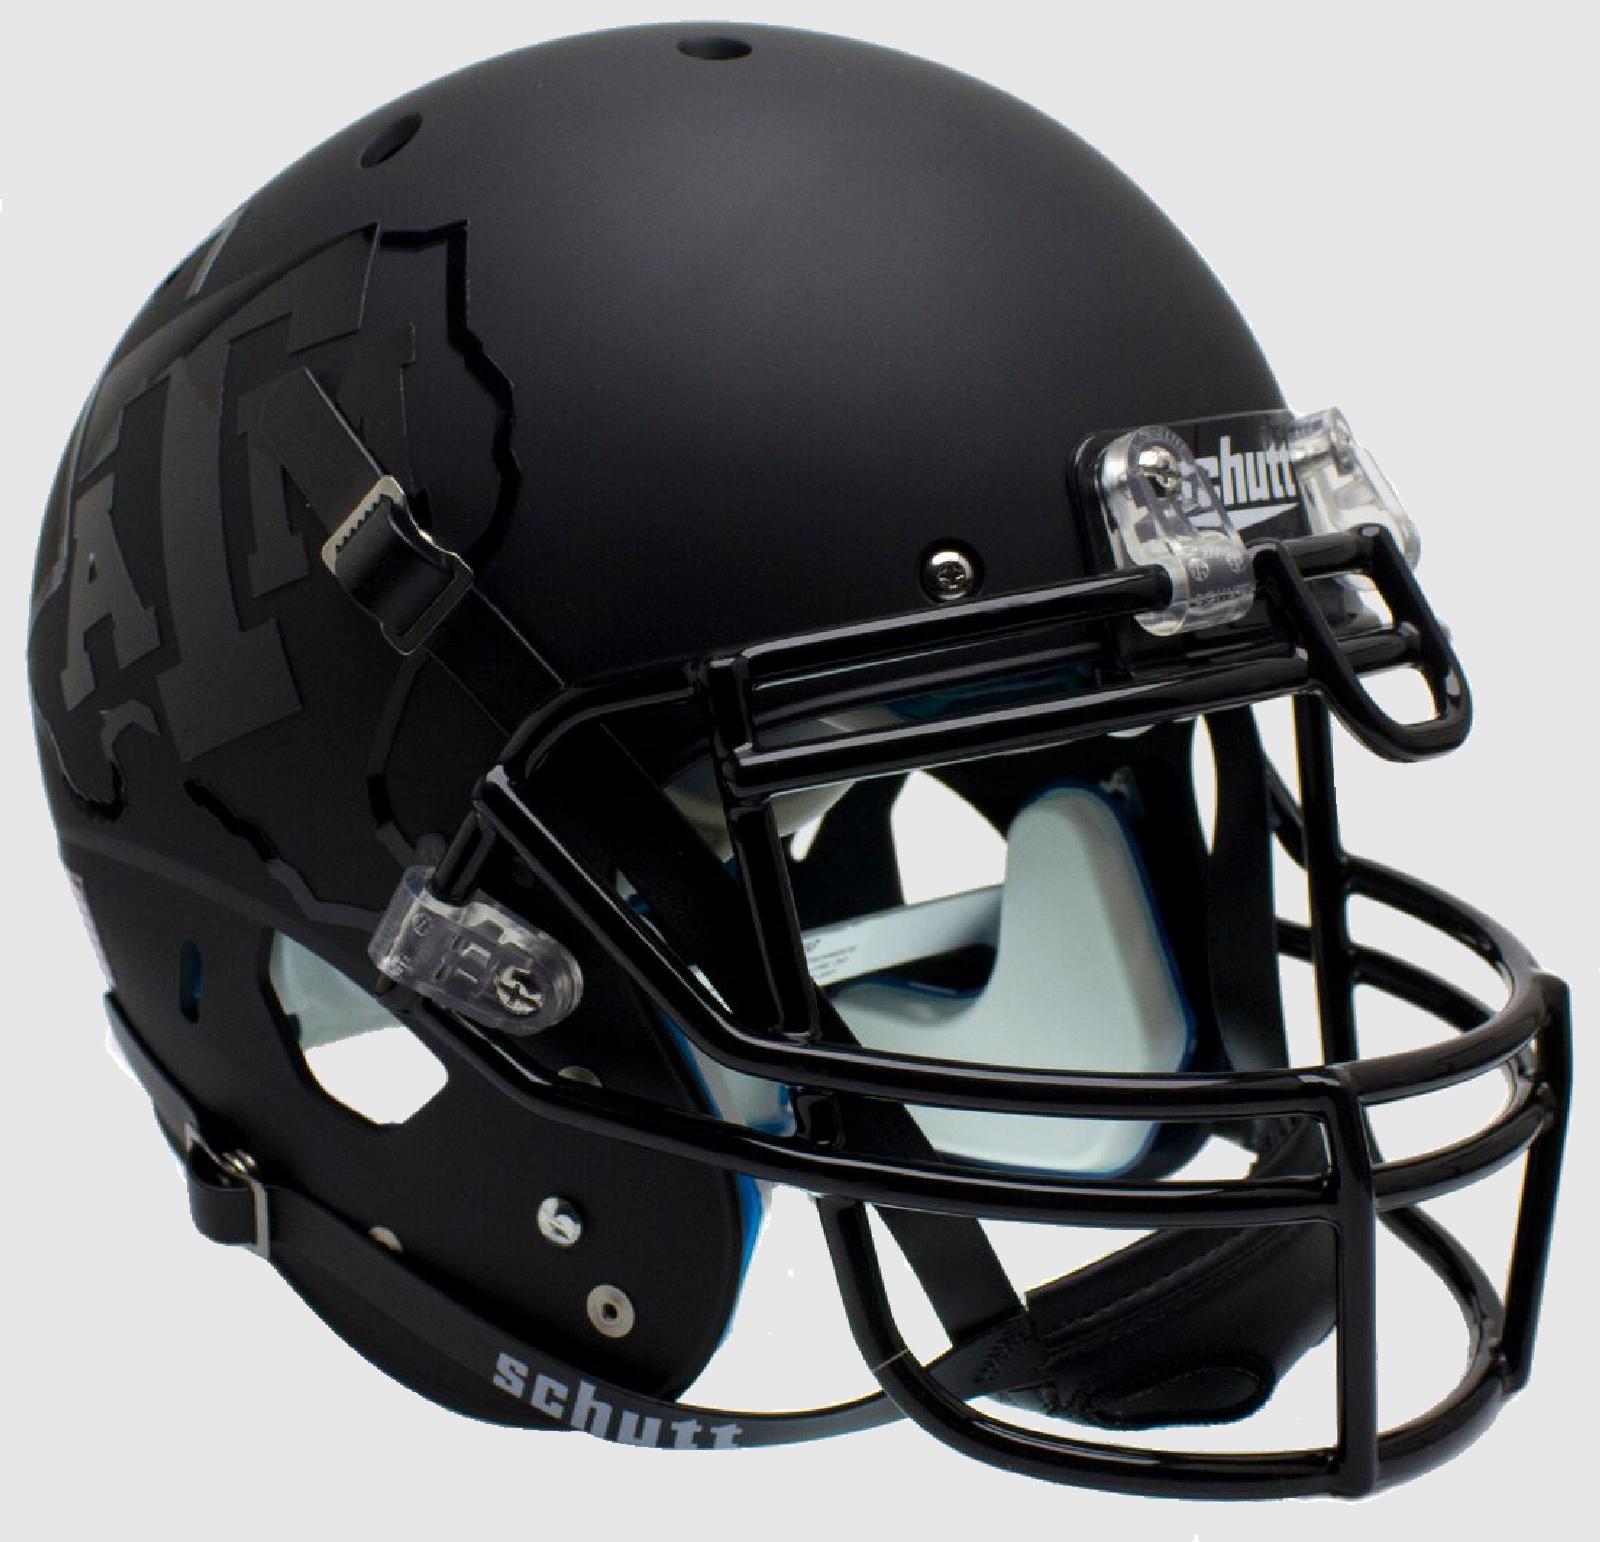 Texas A&M Aggies Authentic College XP Football Helmet Schutt <B>2015 Matte Black</B>